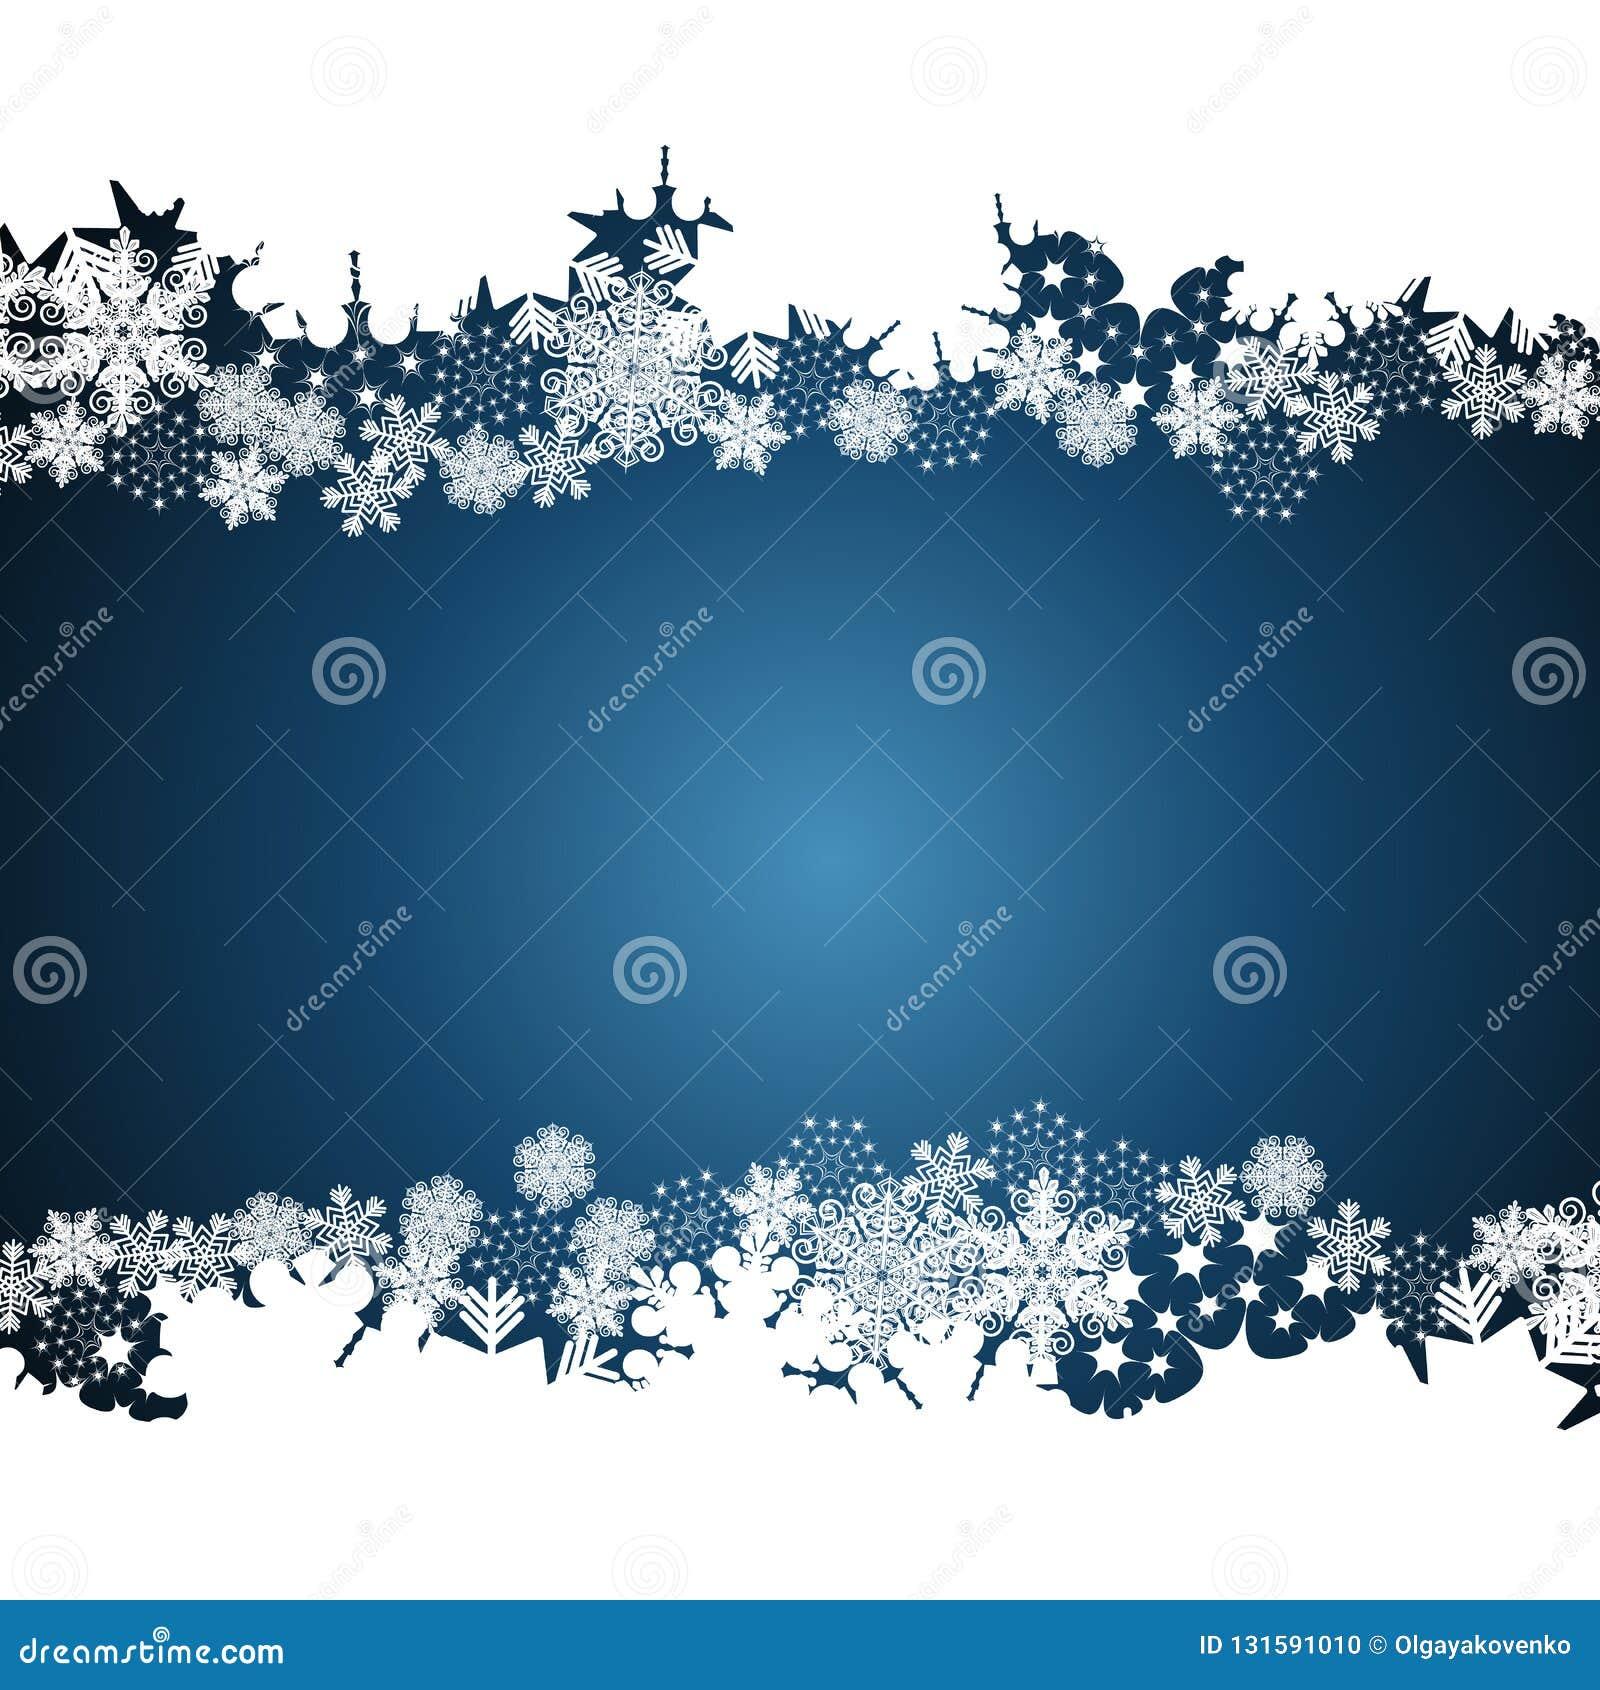 Christmas border, snowflake design background